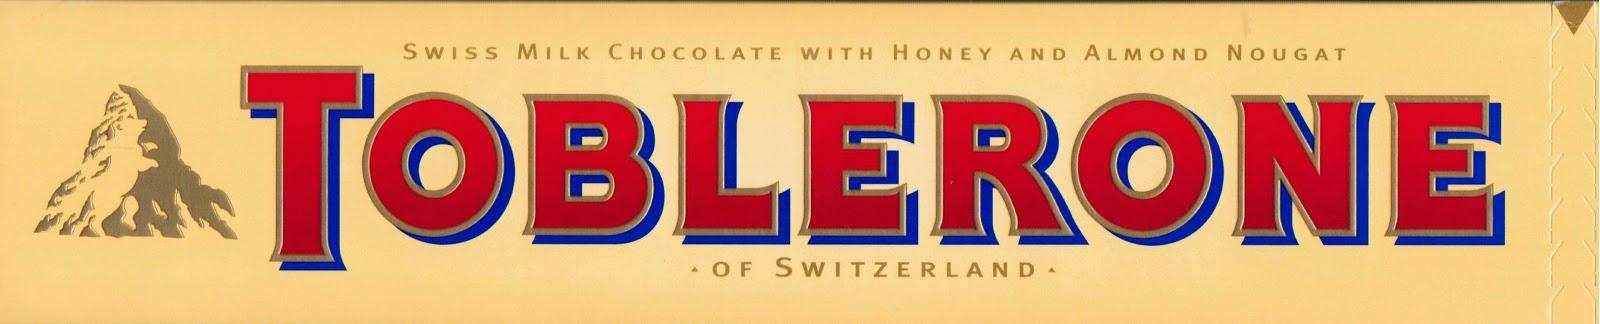 The Secret Behind Toblerone Logo Revealed